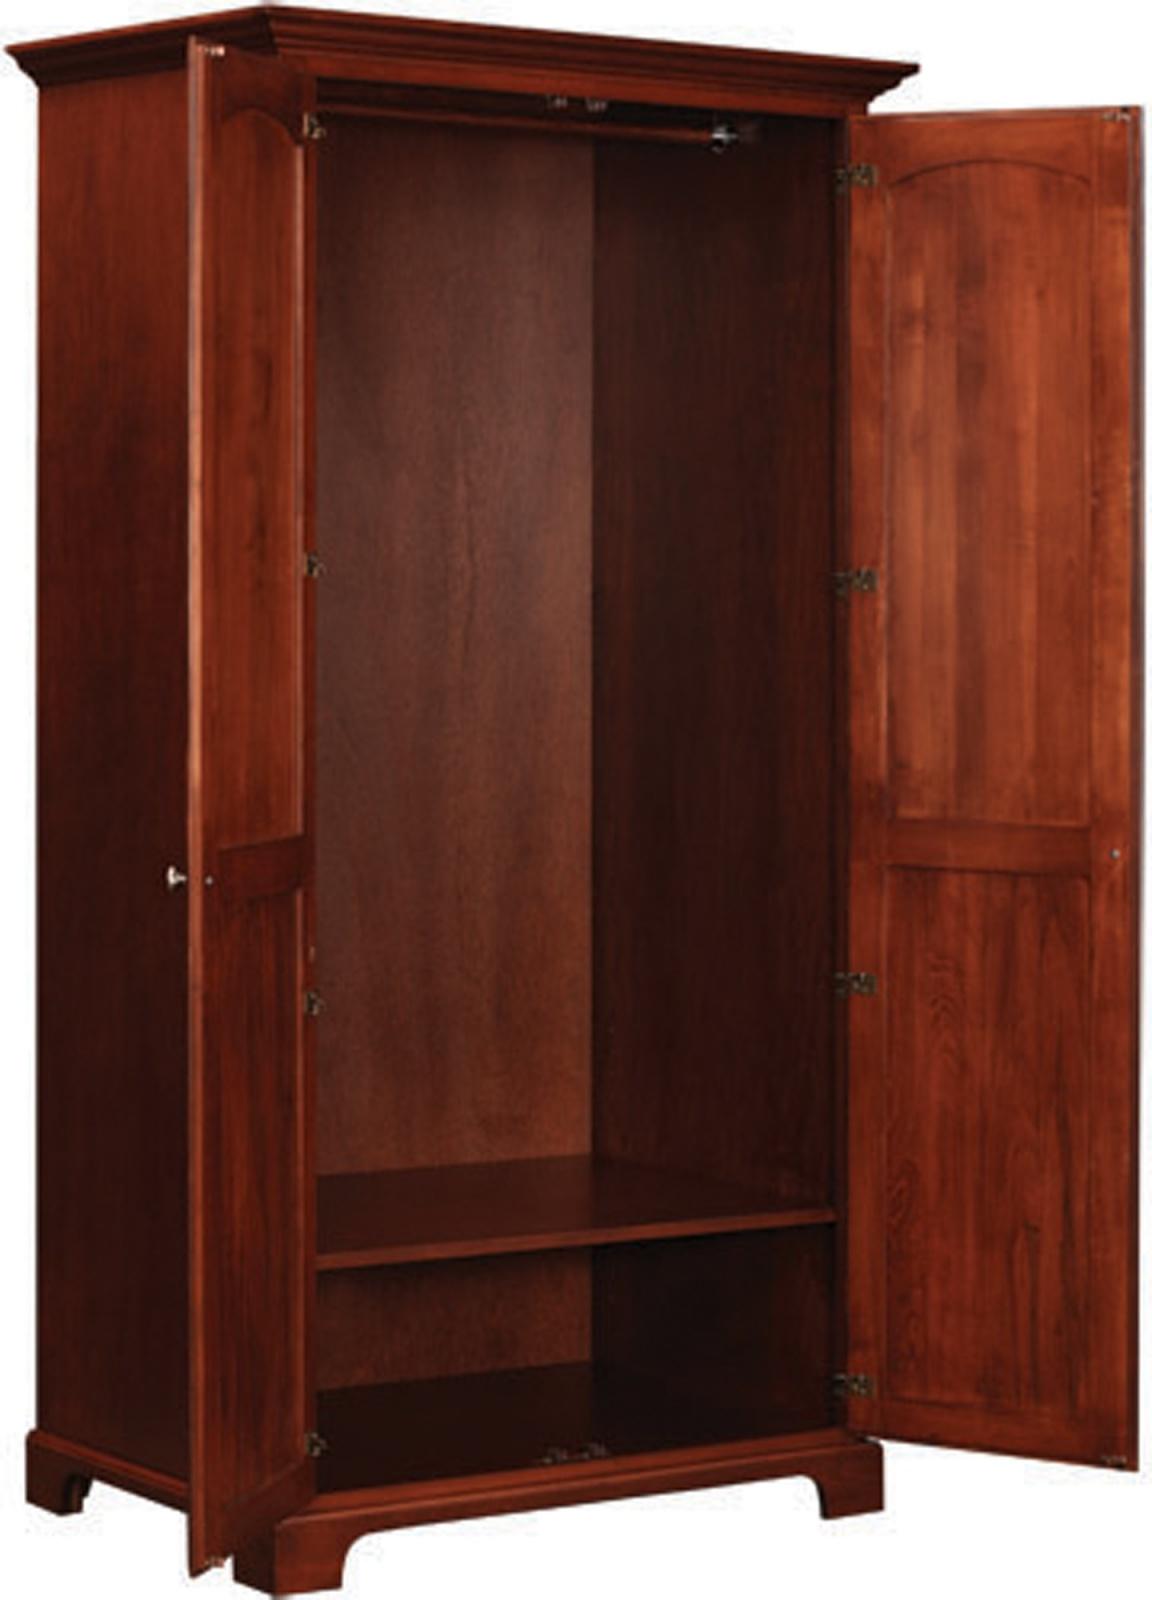 SO-159 Wardrobe (Open).jpg